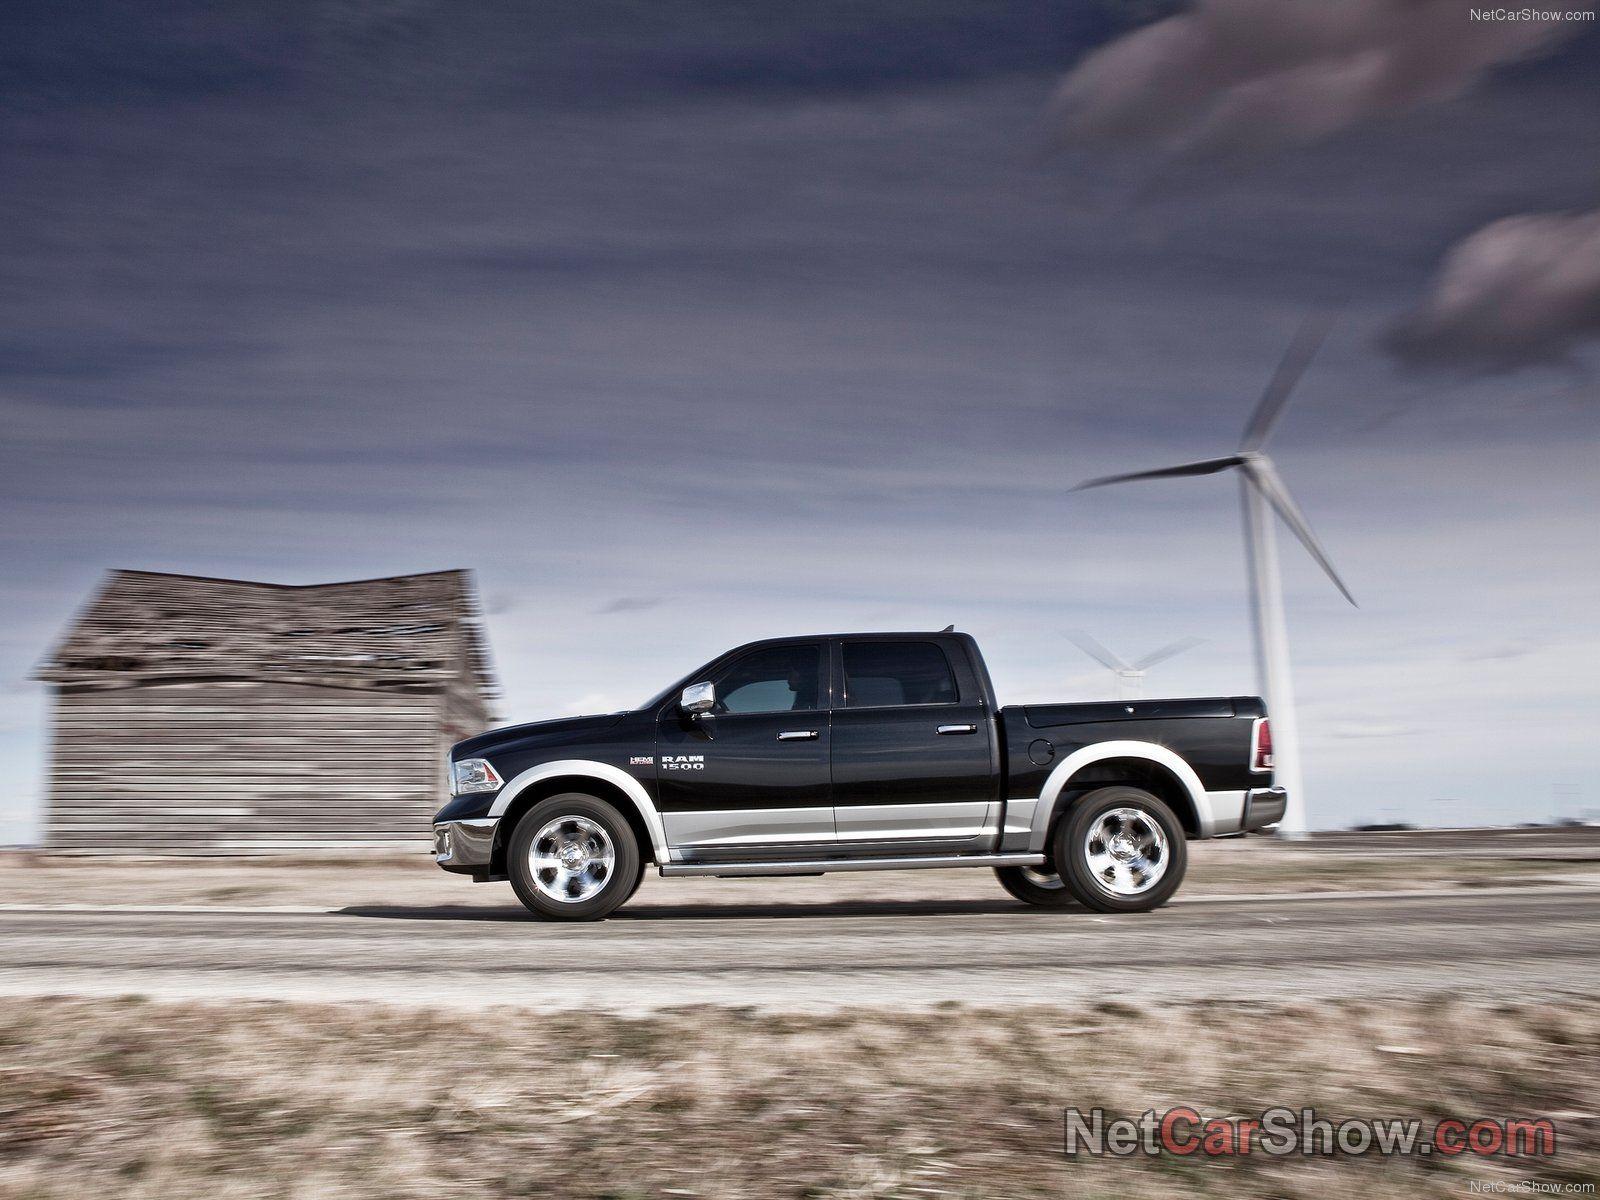 free Dodge Ram 1500 hd wallpaper Dodge 1500, Dodge,